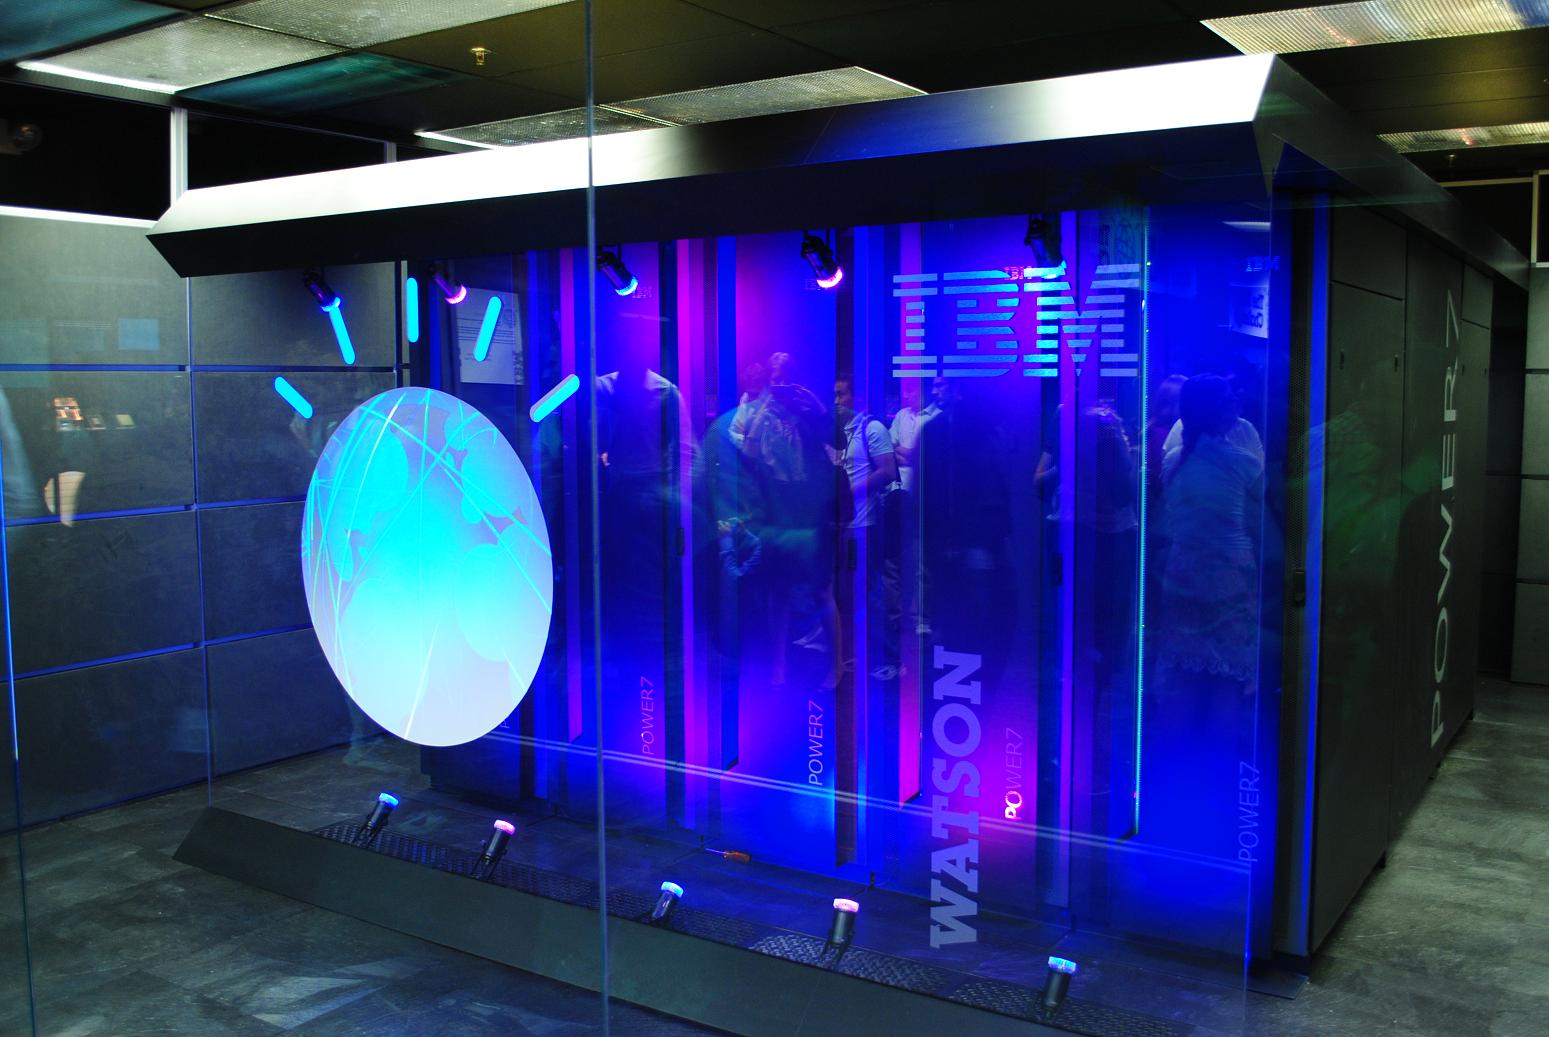 Imagens IBM techngies